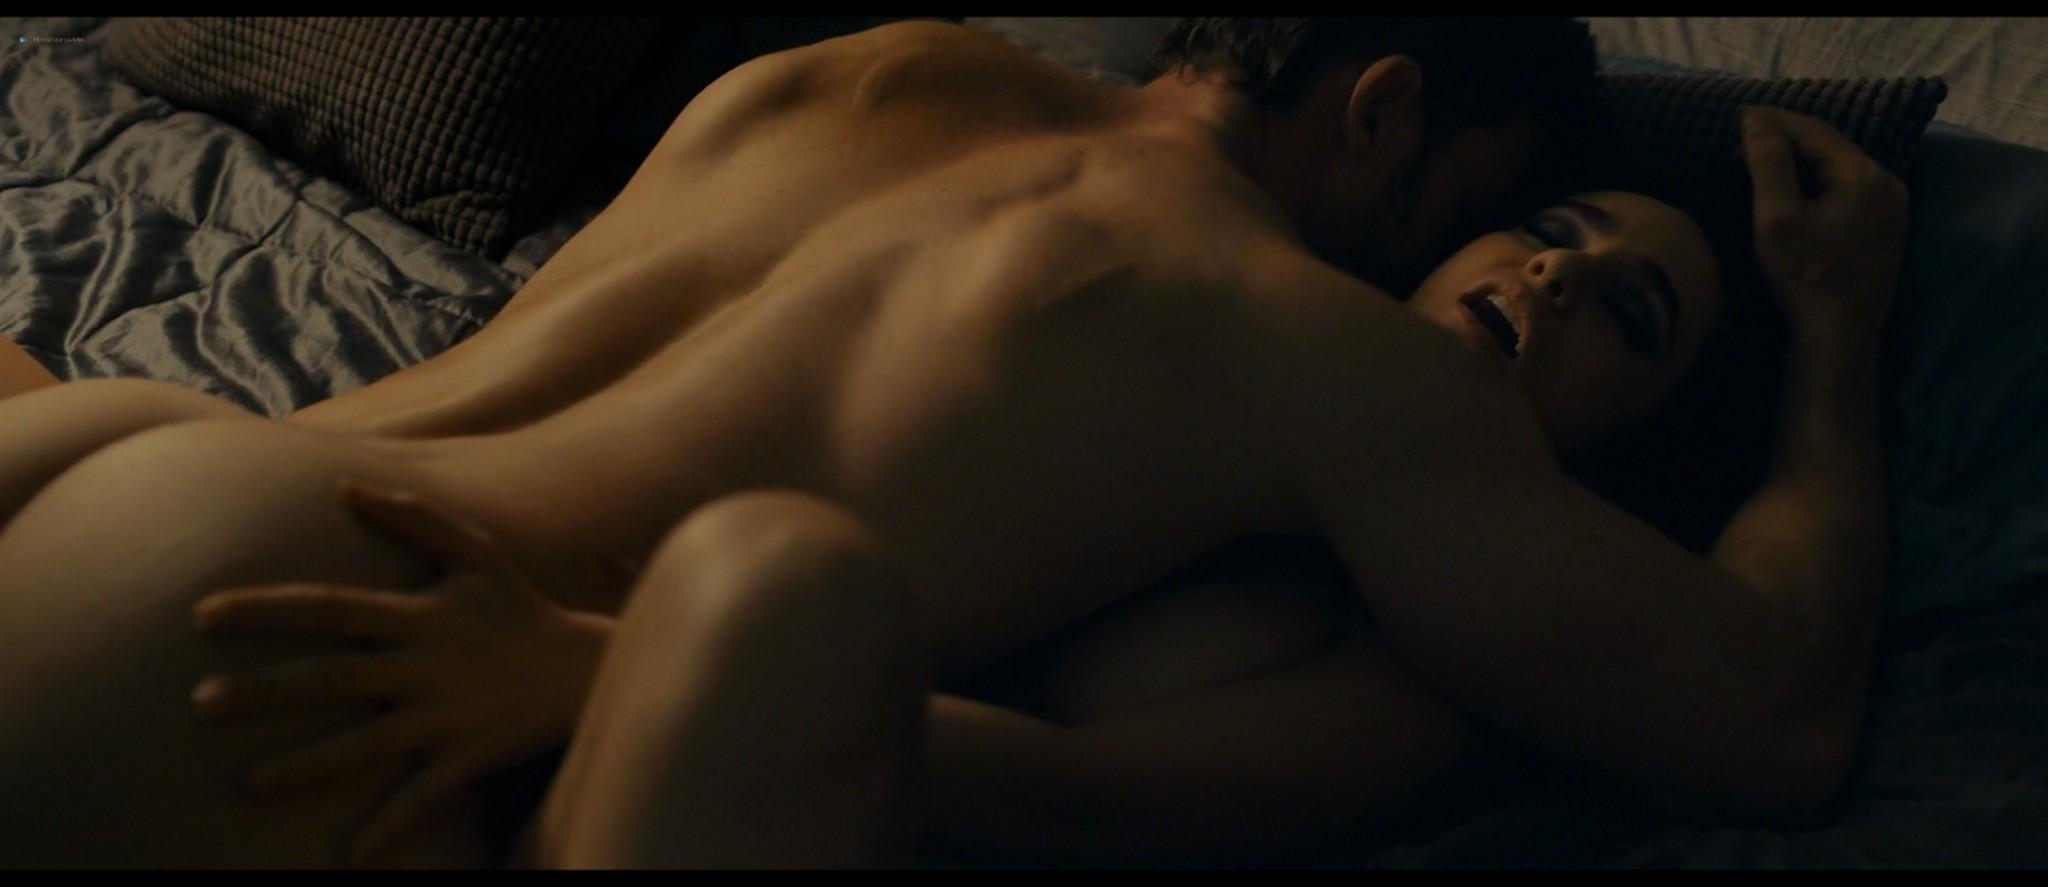 Alicia Sanz nude hot sex - En Brazos de un sesino (2019) HD 1080p Web (2)